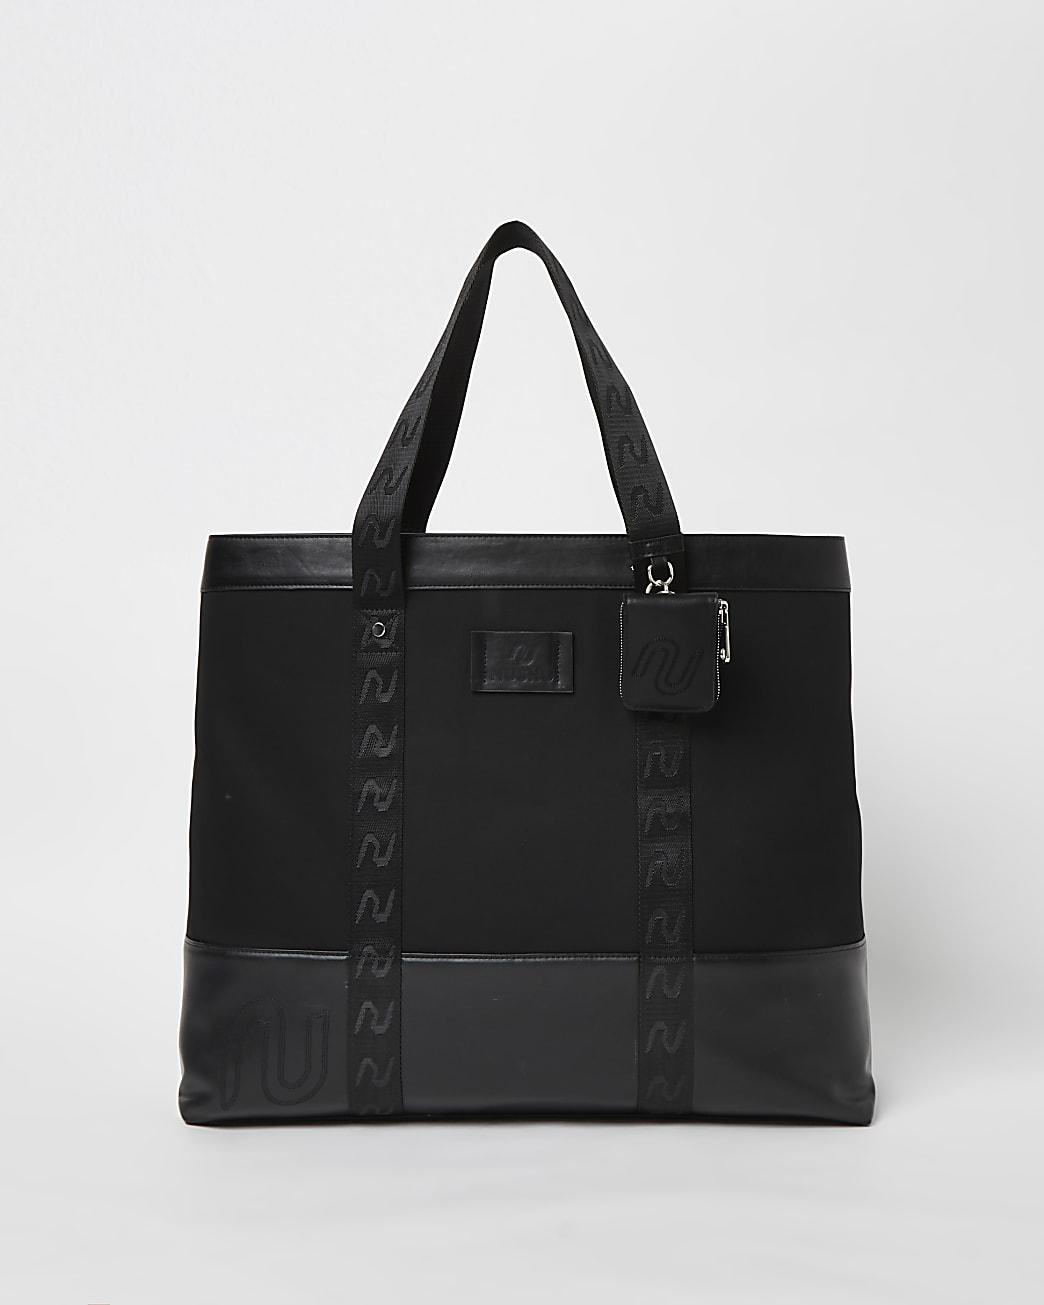 Black NUSHU shopper bag